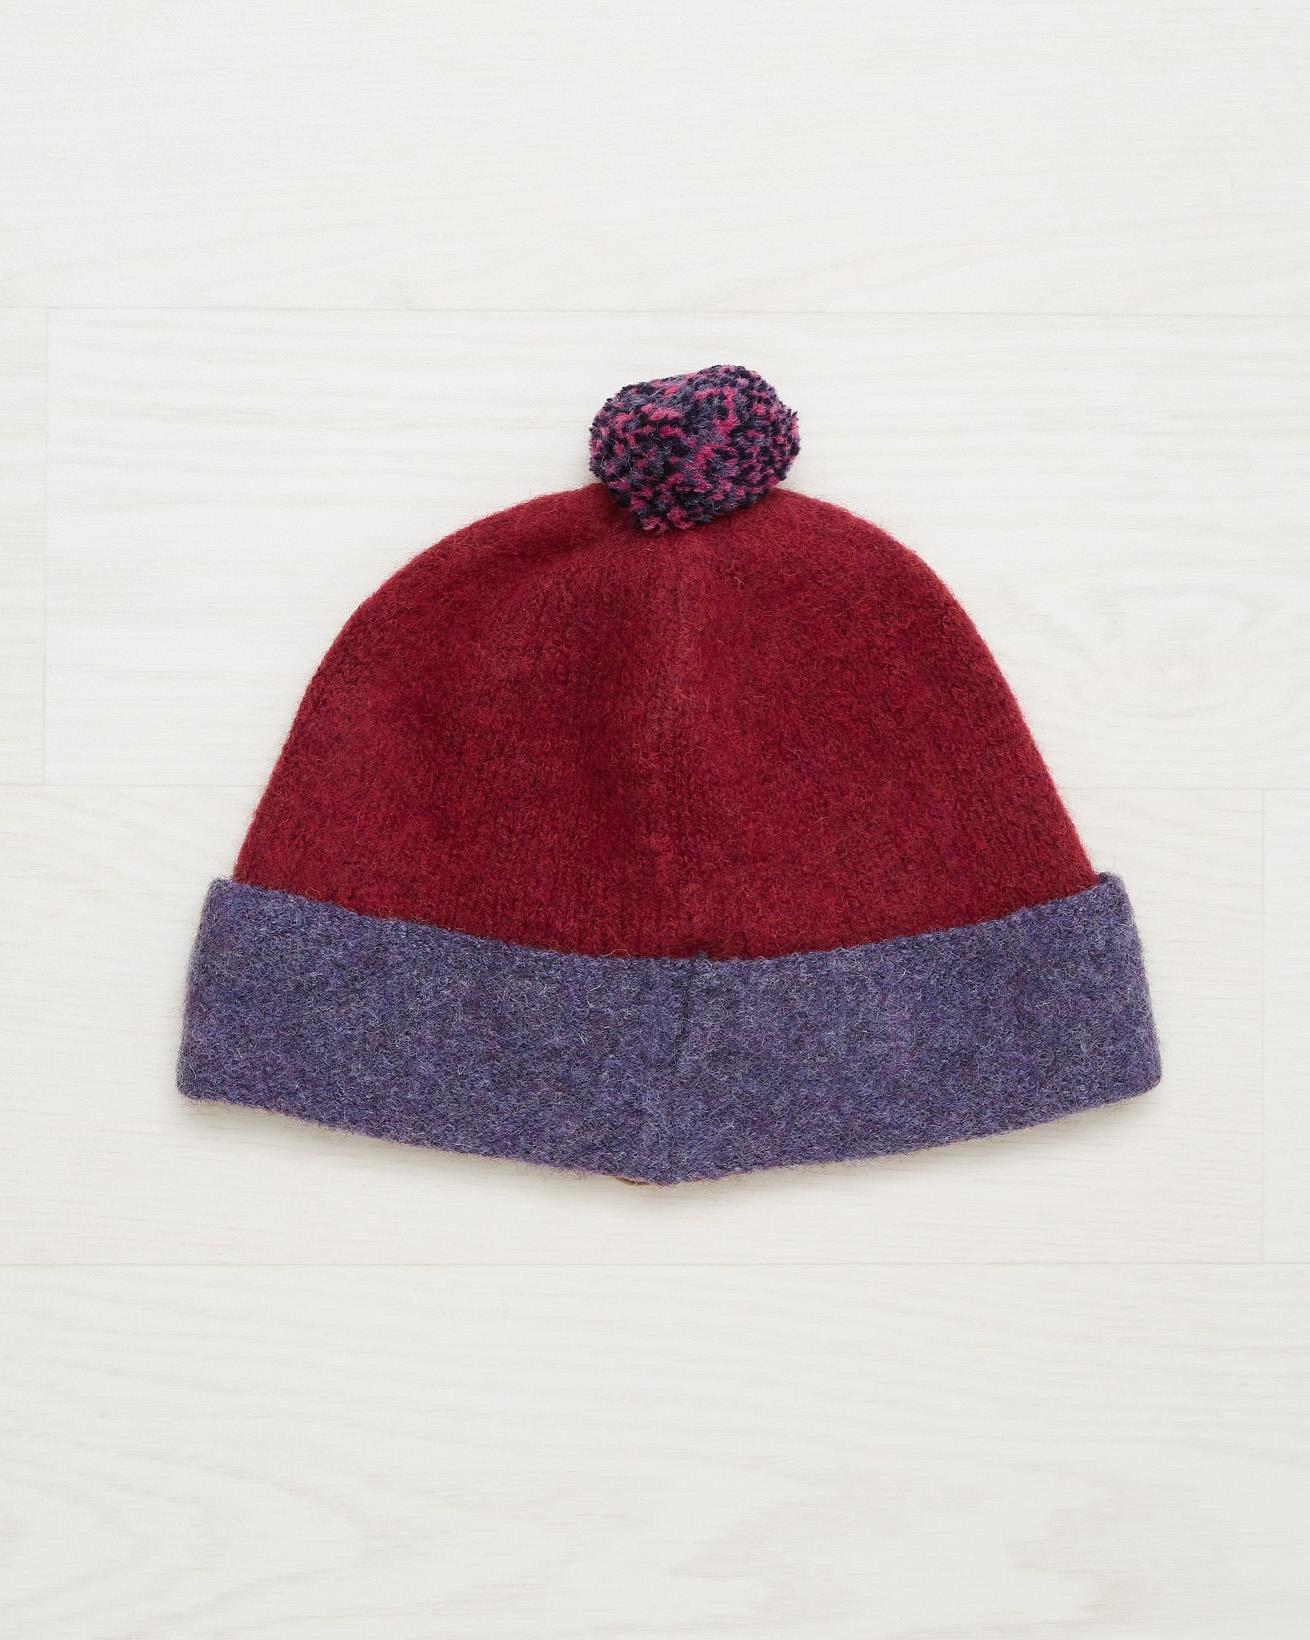 Shetland Wool Bobble Hat - Claret - One Size - 2541